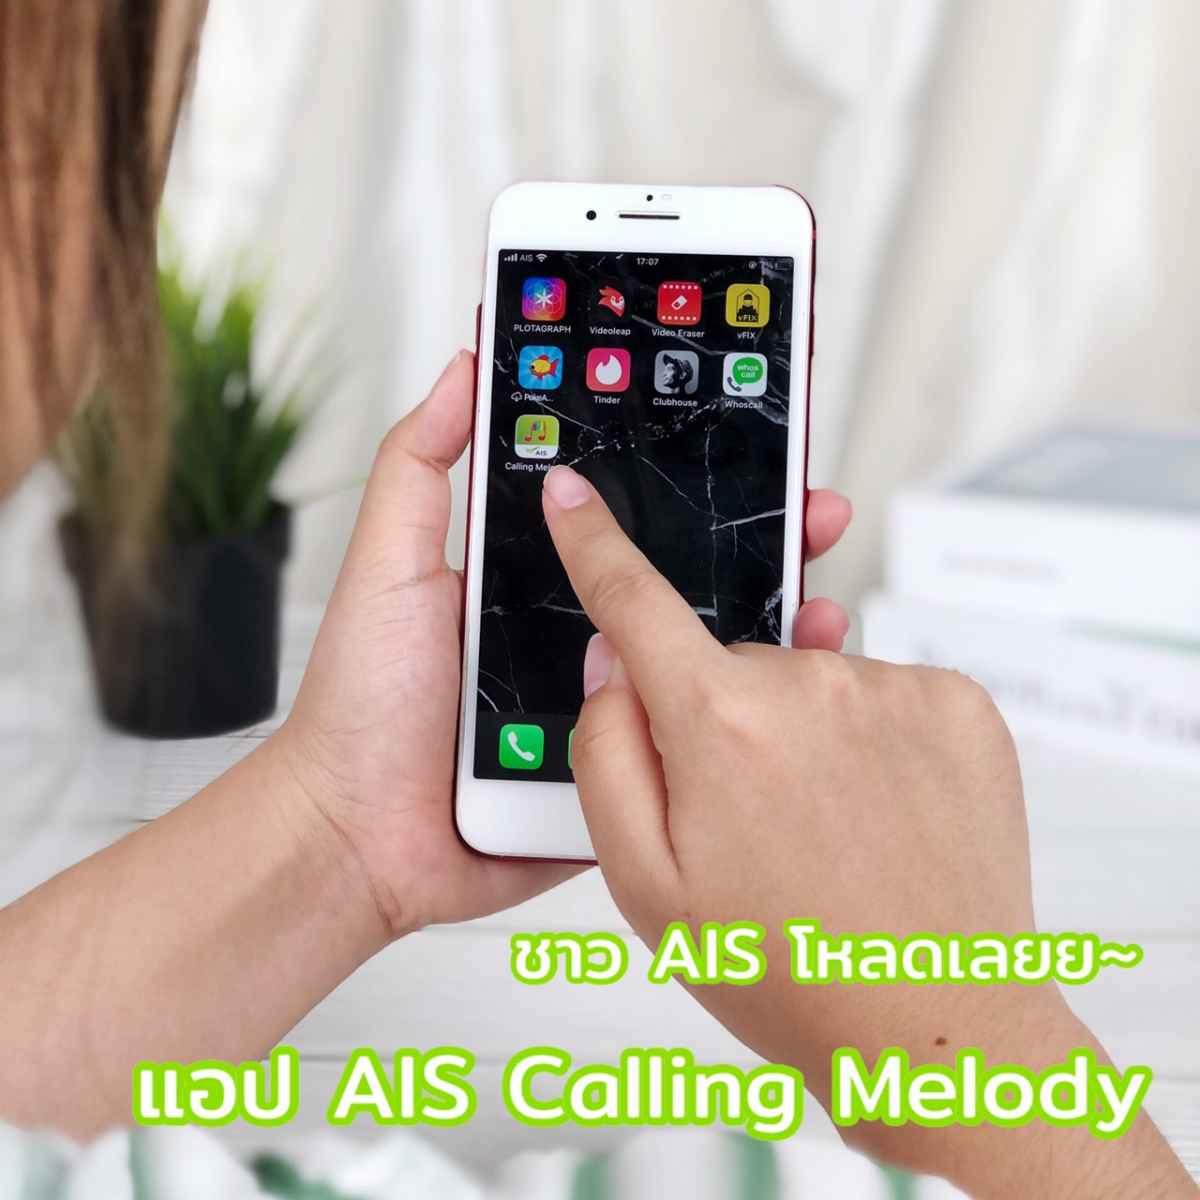 AIS Calling Melody